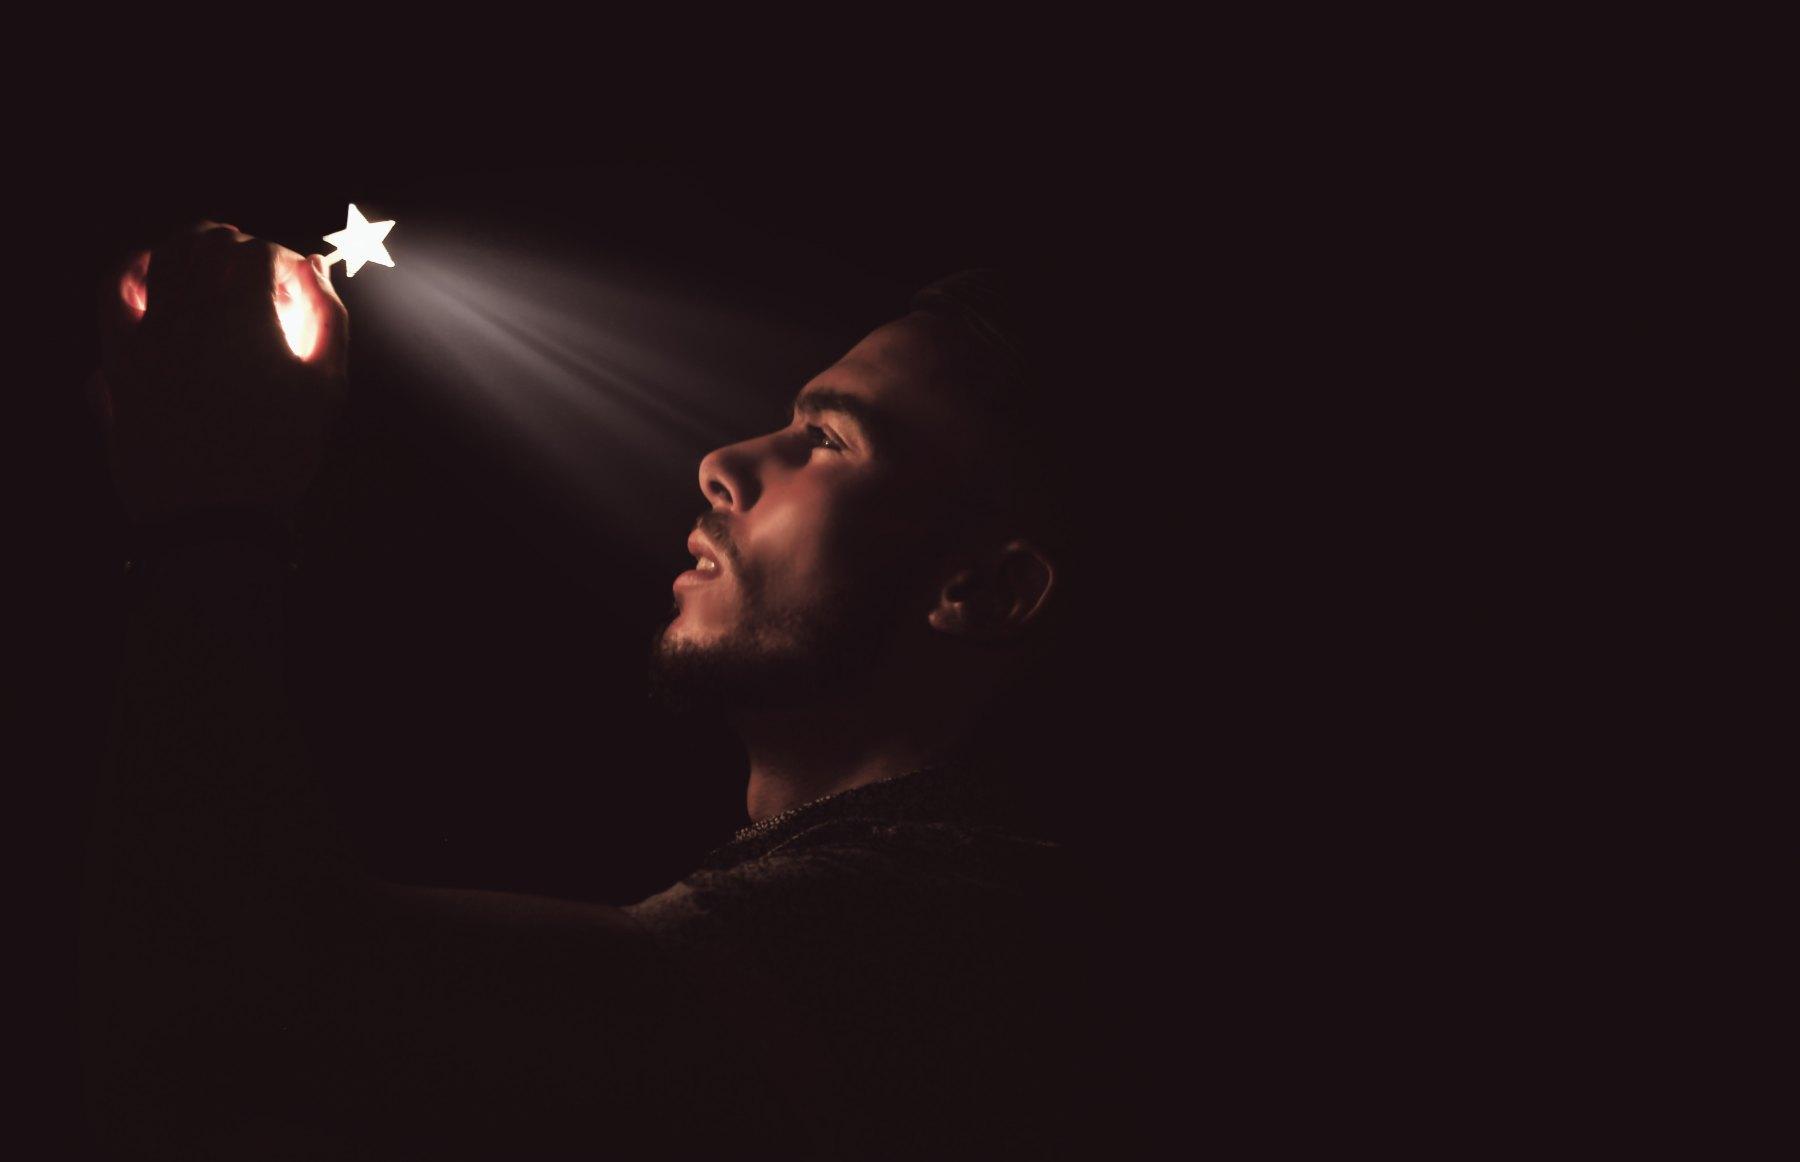 Starlight, illumination, Man, inspiration, hubris